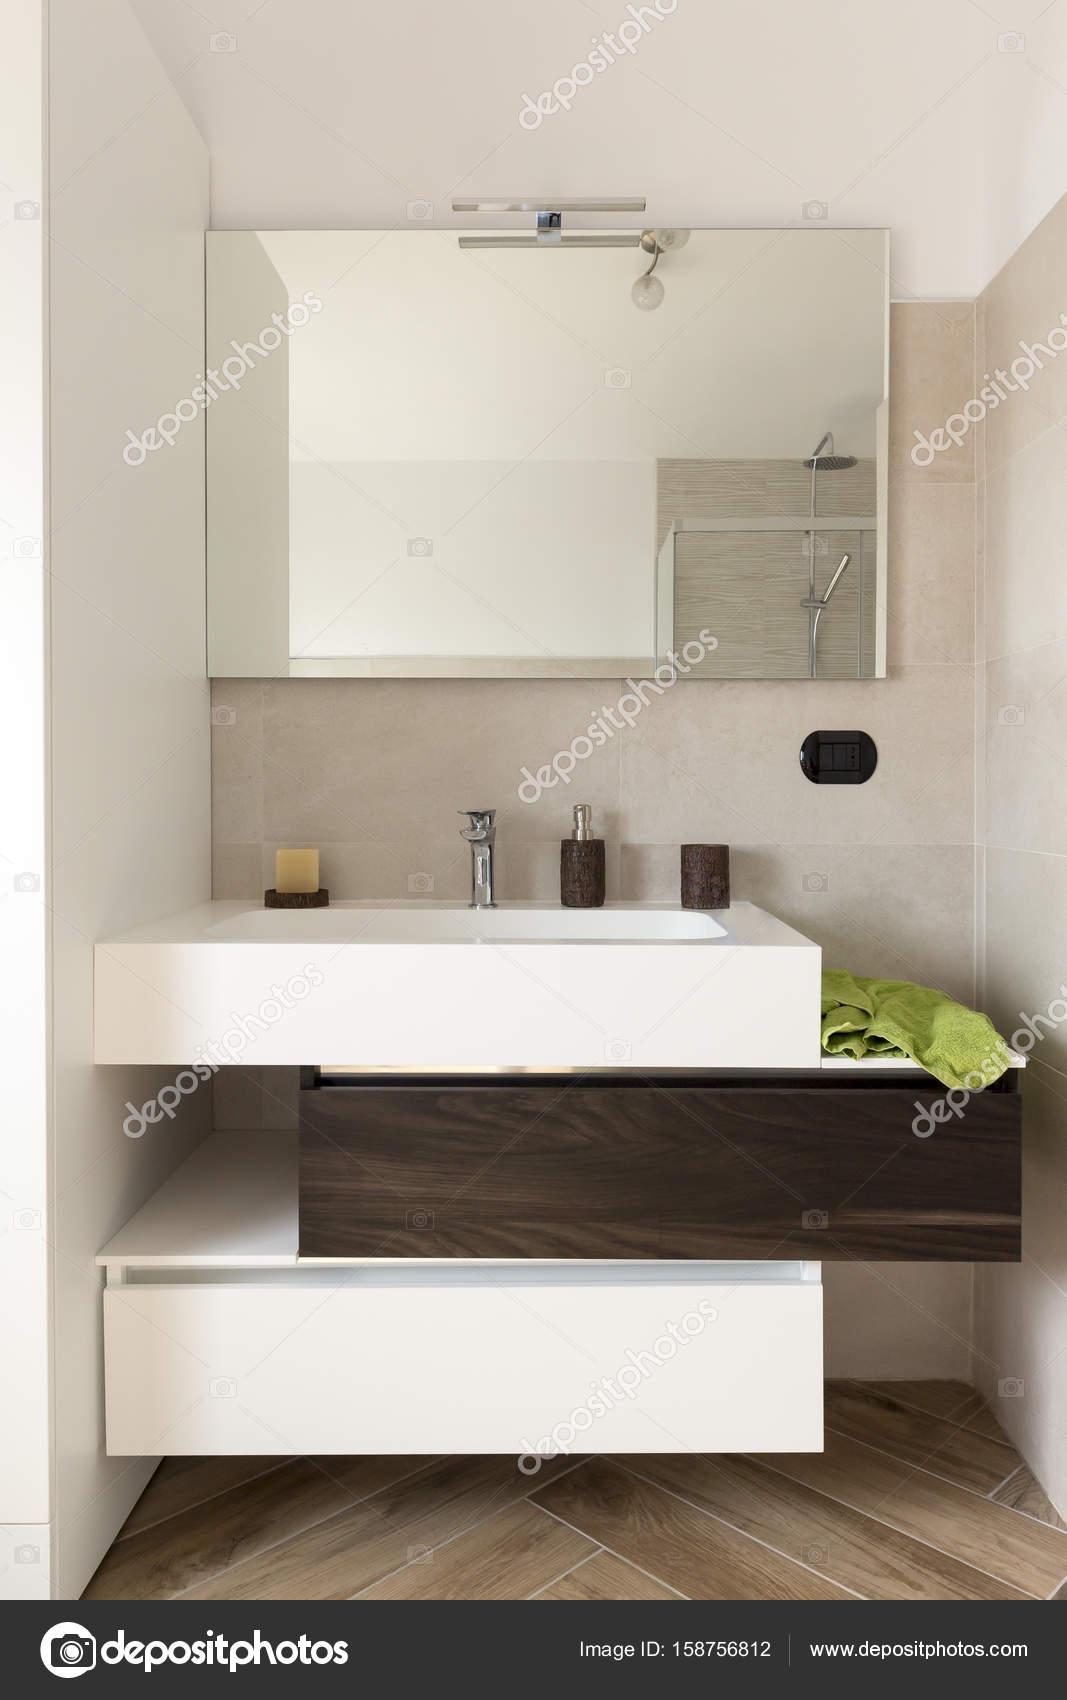 Mobiele wastafel in de badkamer — Stockfoto © matteogirelli #158756812